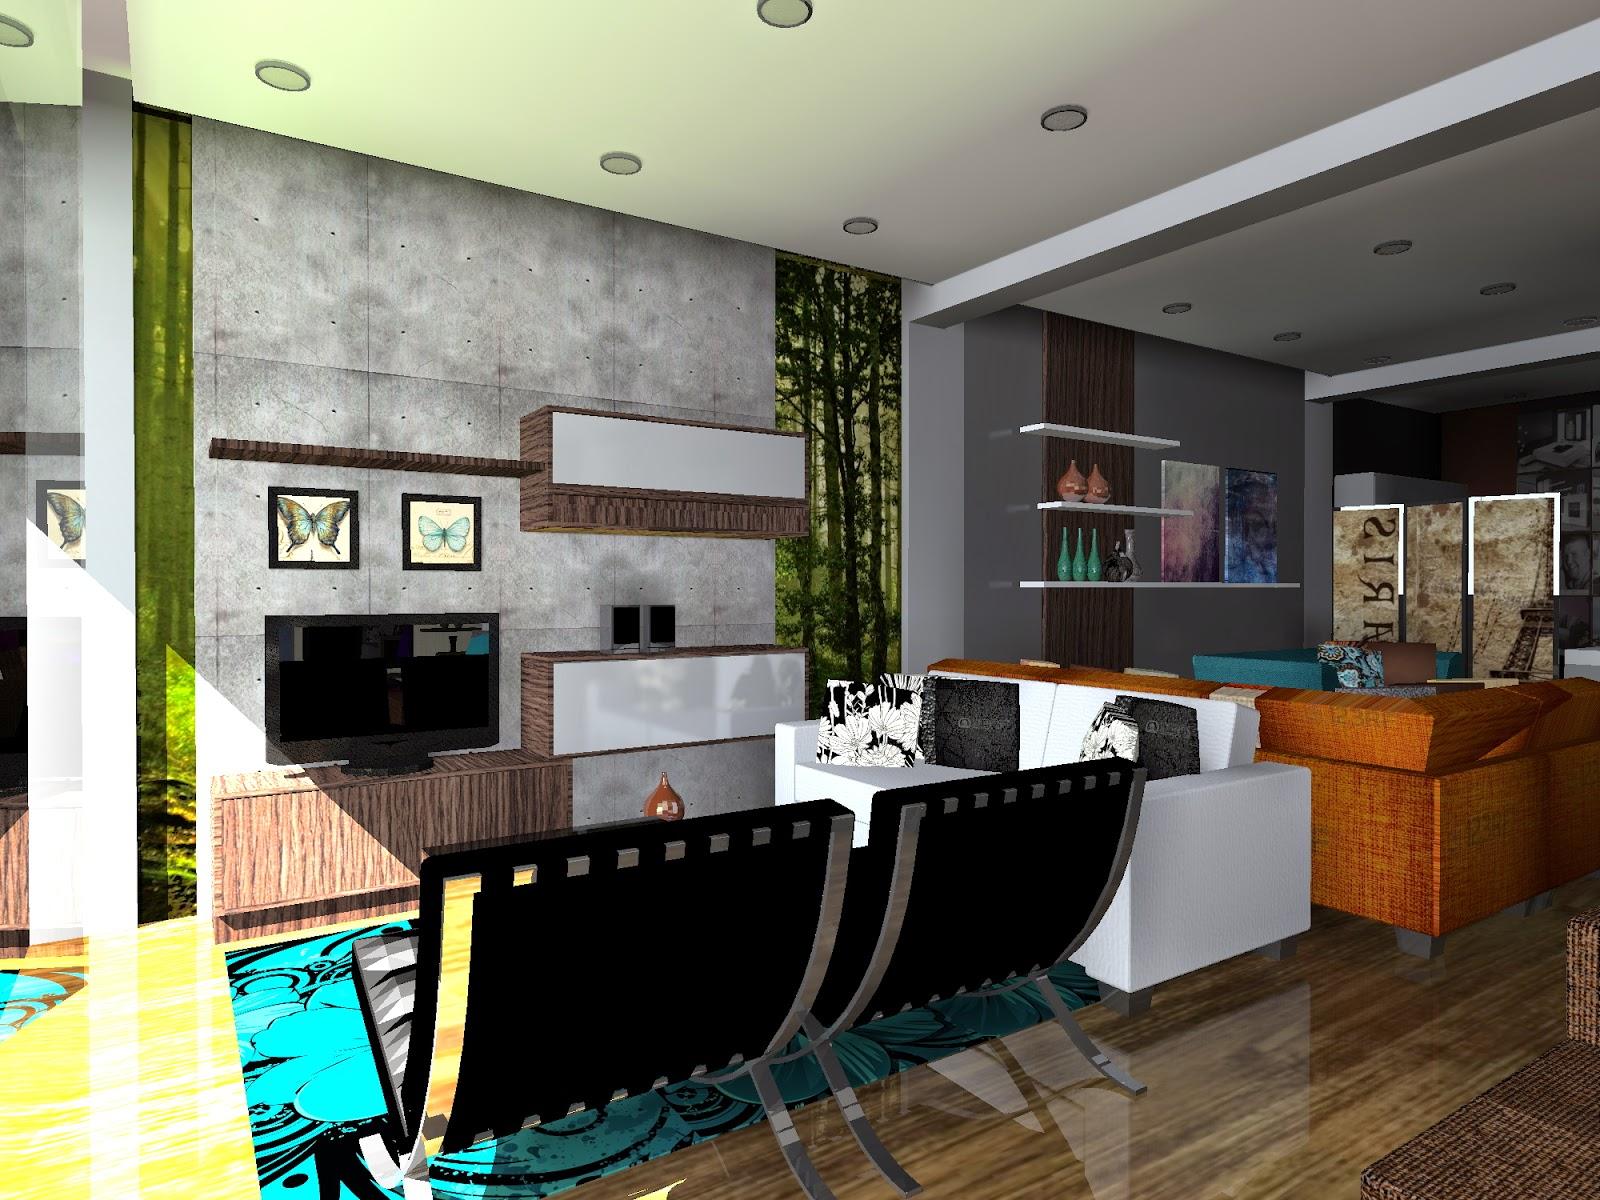 Tiendas de muebles yecla latest ambiente tu mueble en yecla with tiendas de muebles yecla - Tu mueble on line ...